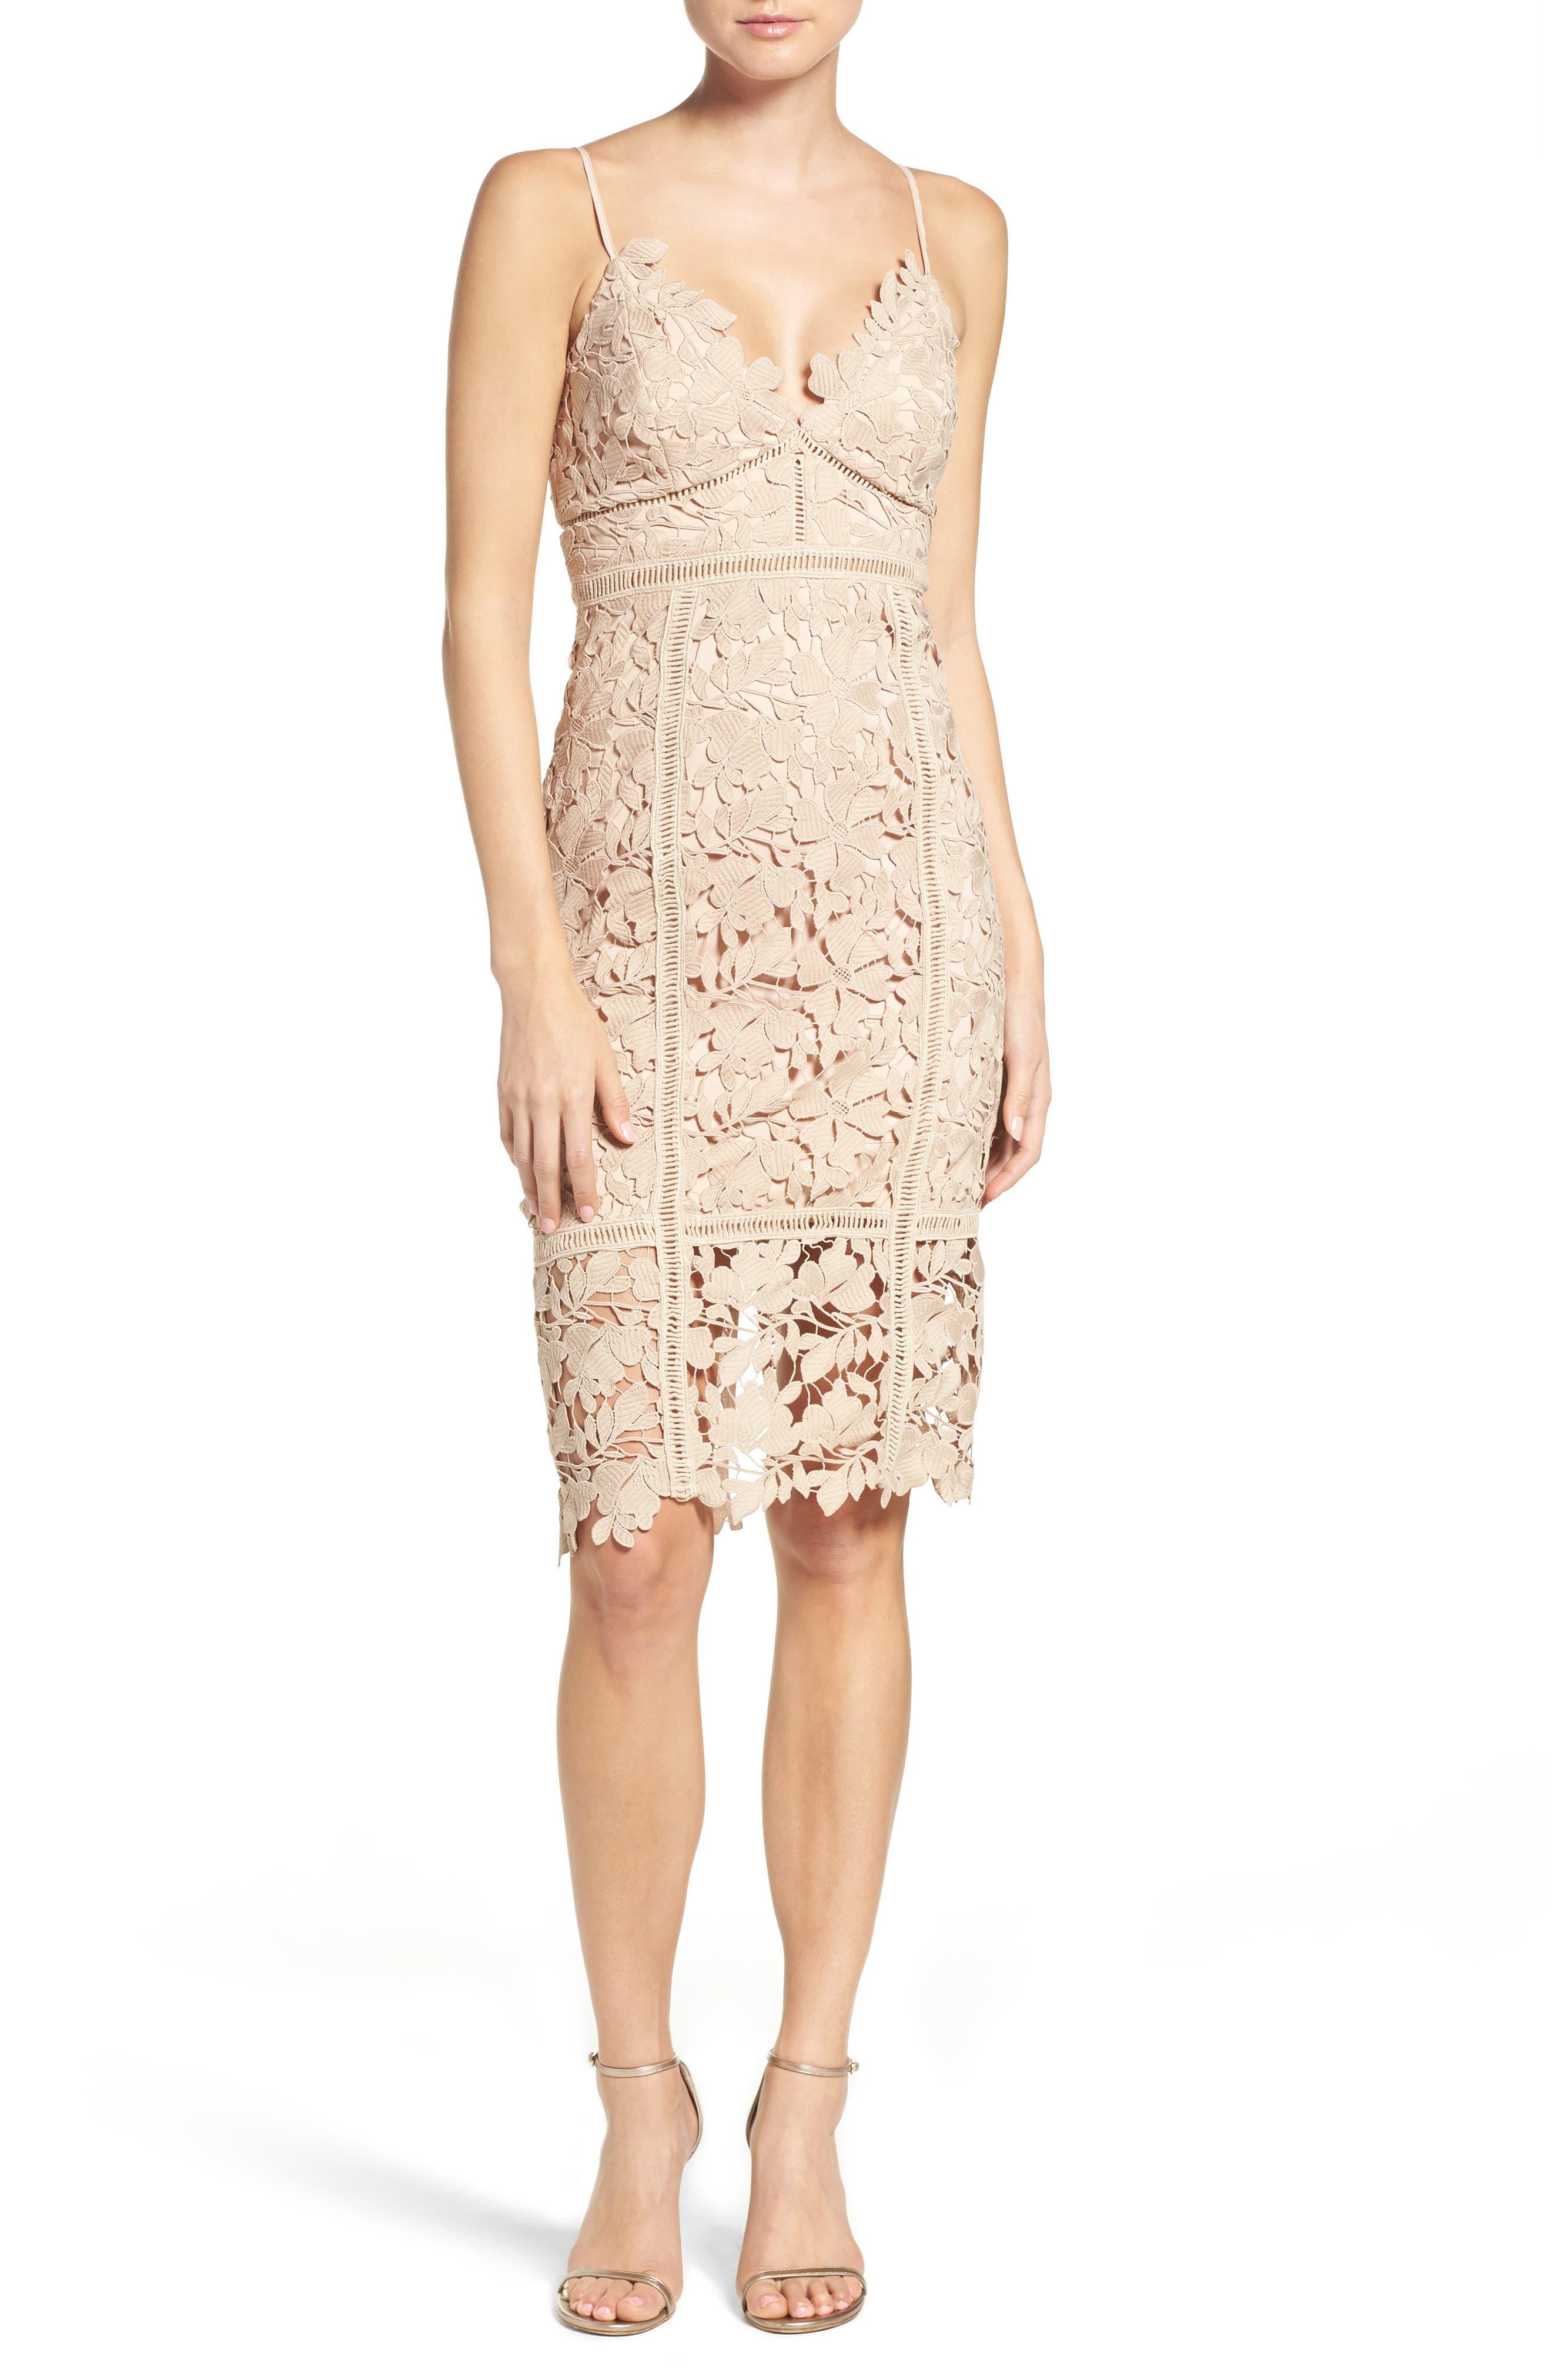 Image of Bardot Botanica Lace Dress